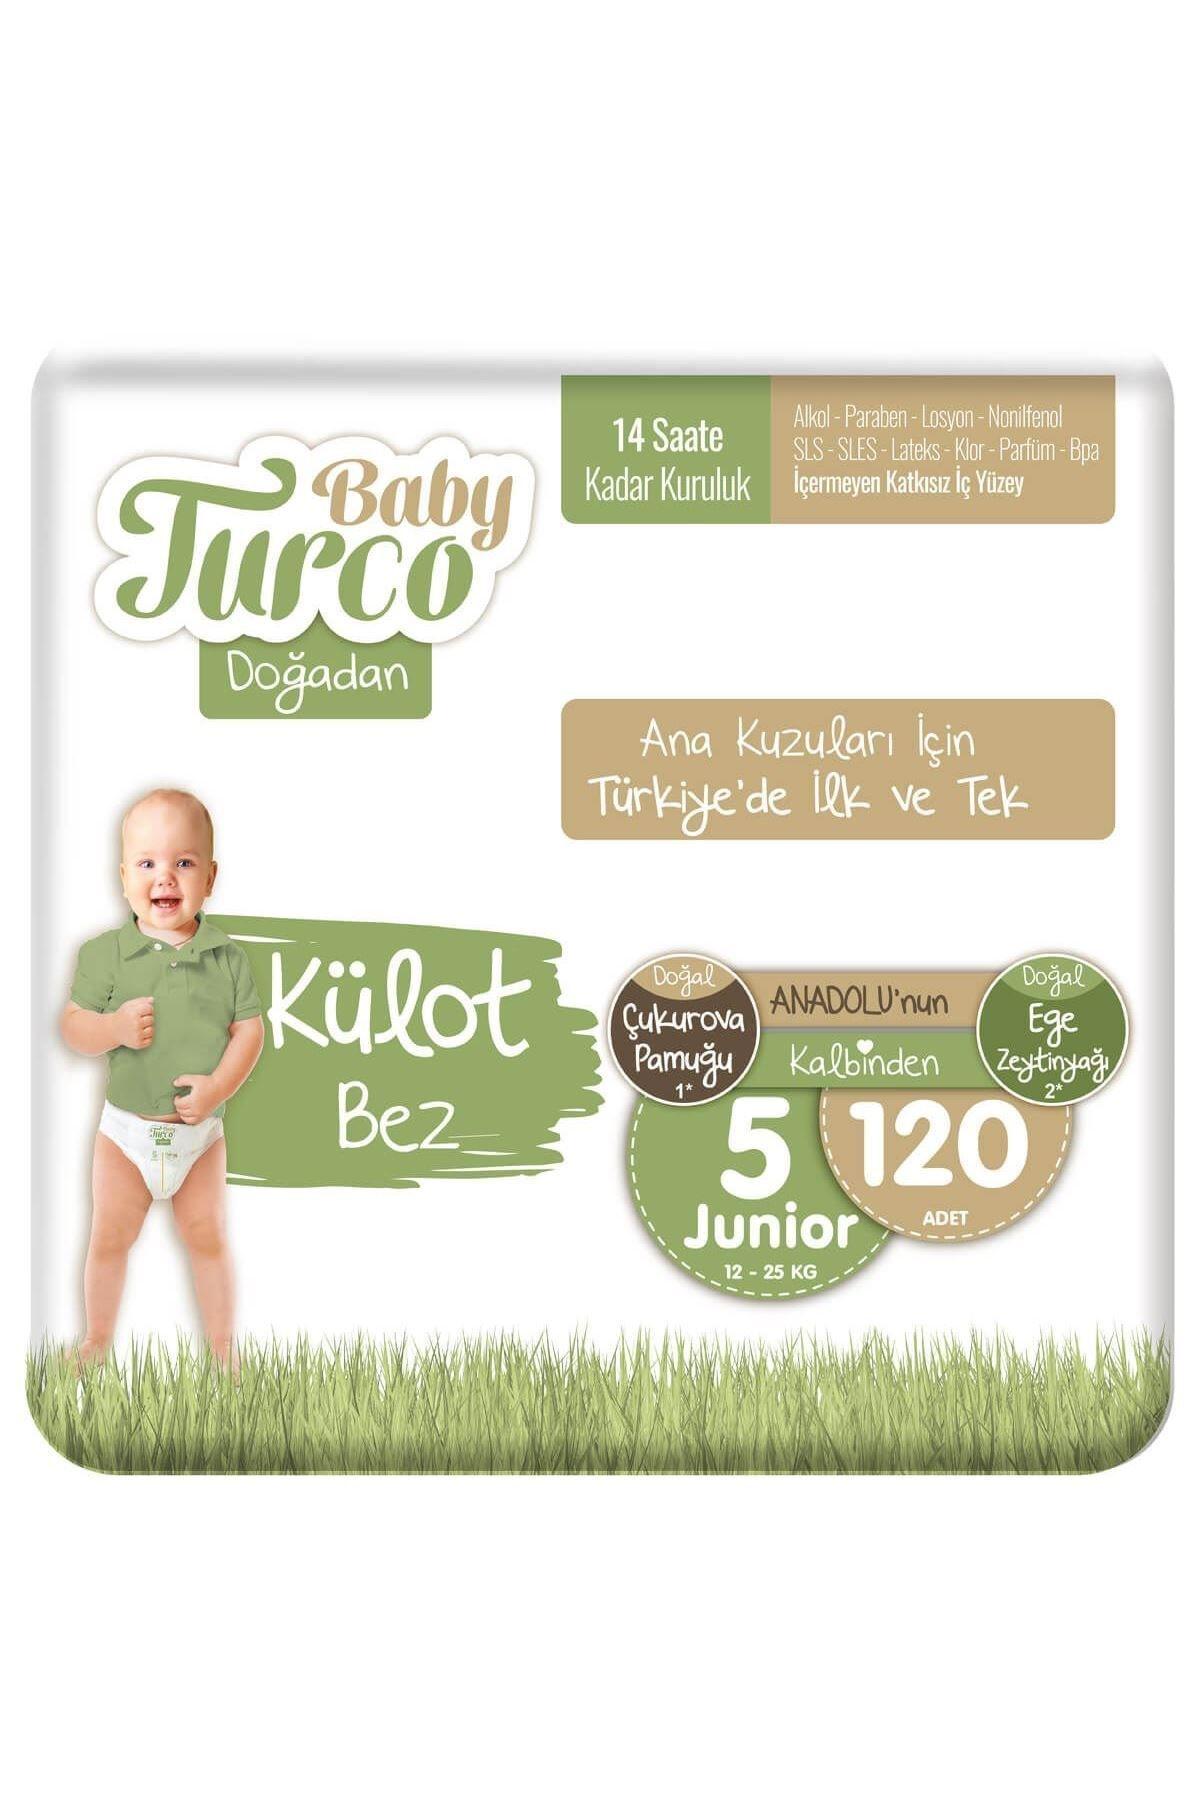 Baby Turco Doğadan Külot Bez 5 Numara Junıor 120 Adet 2